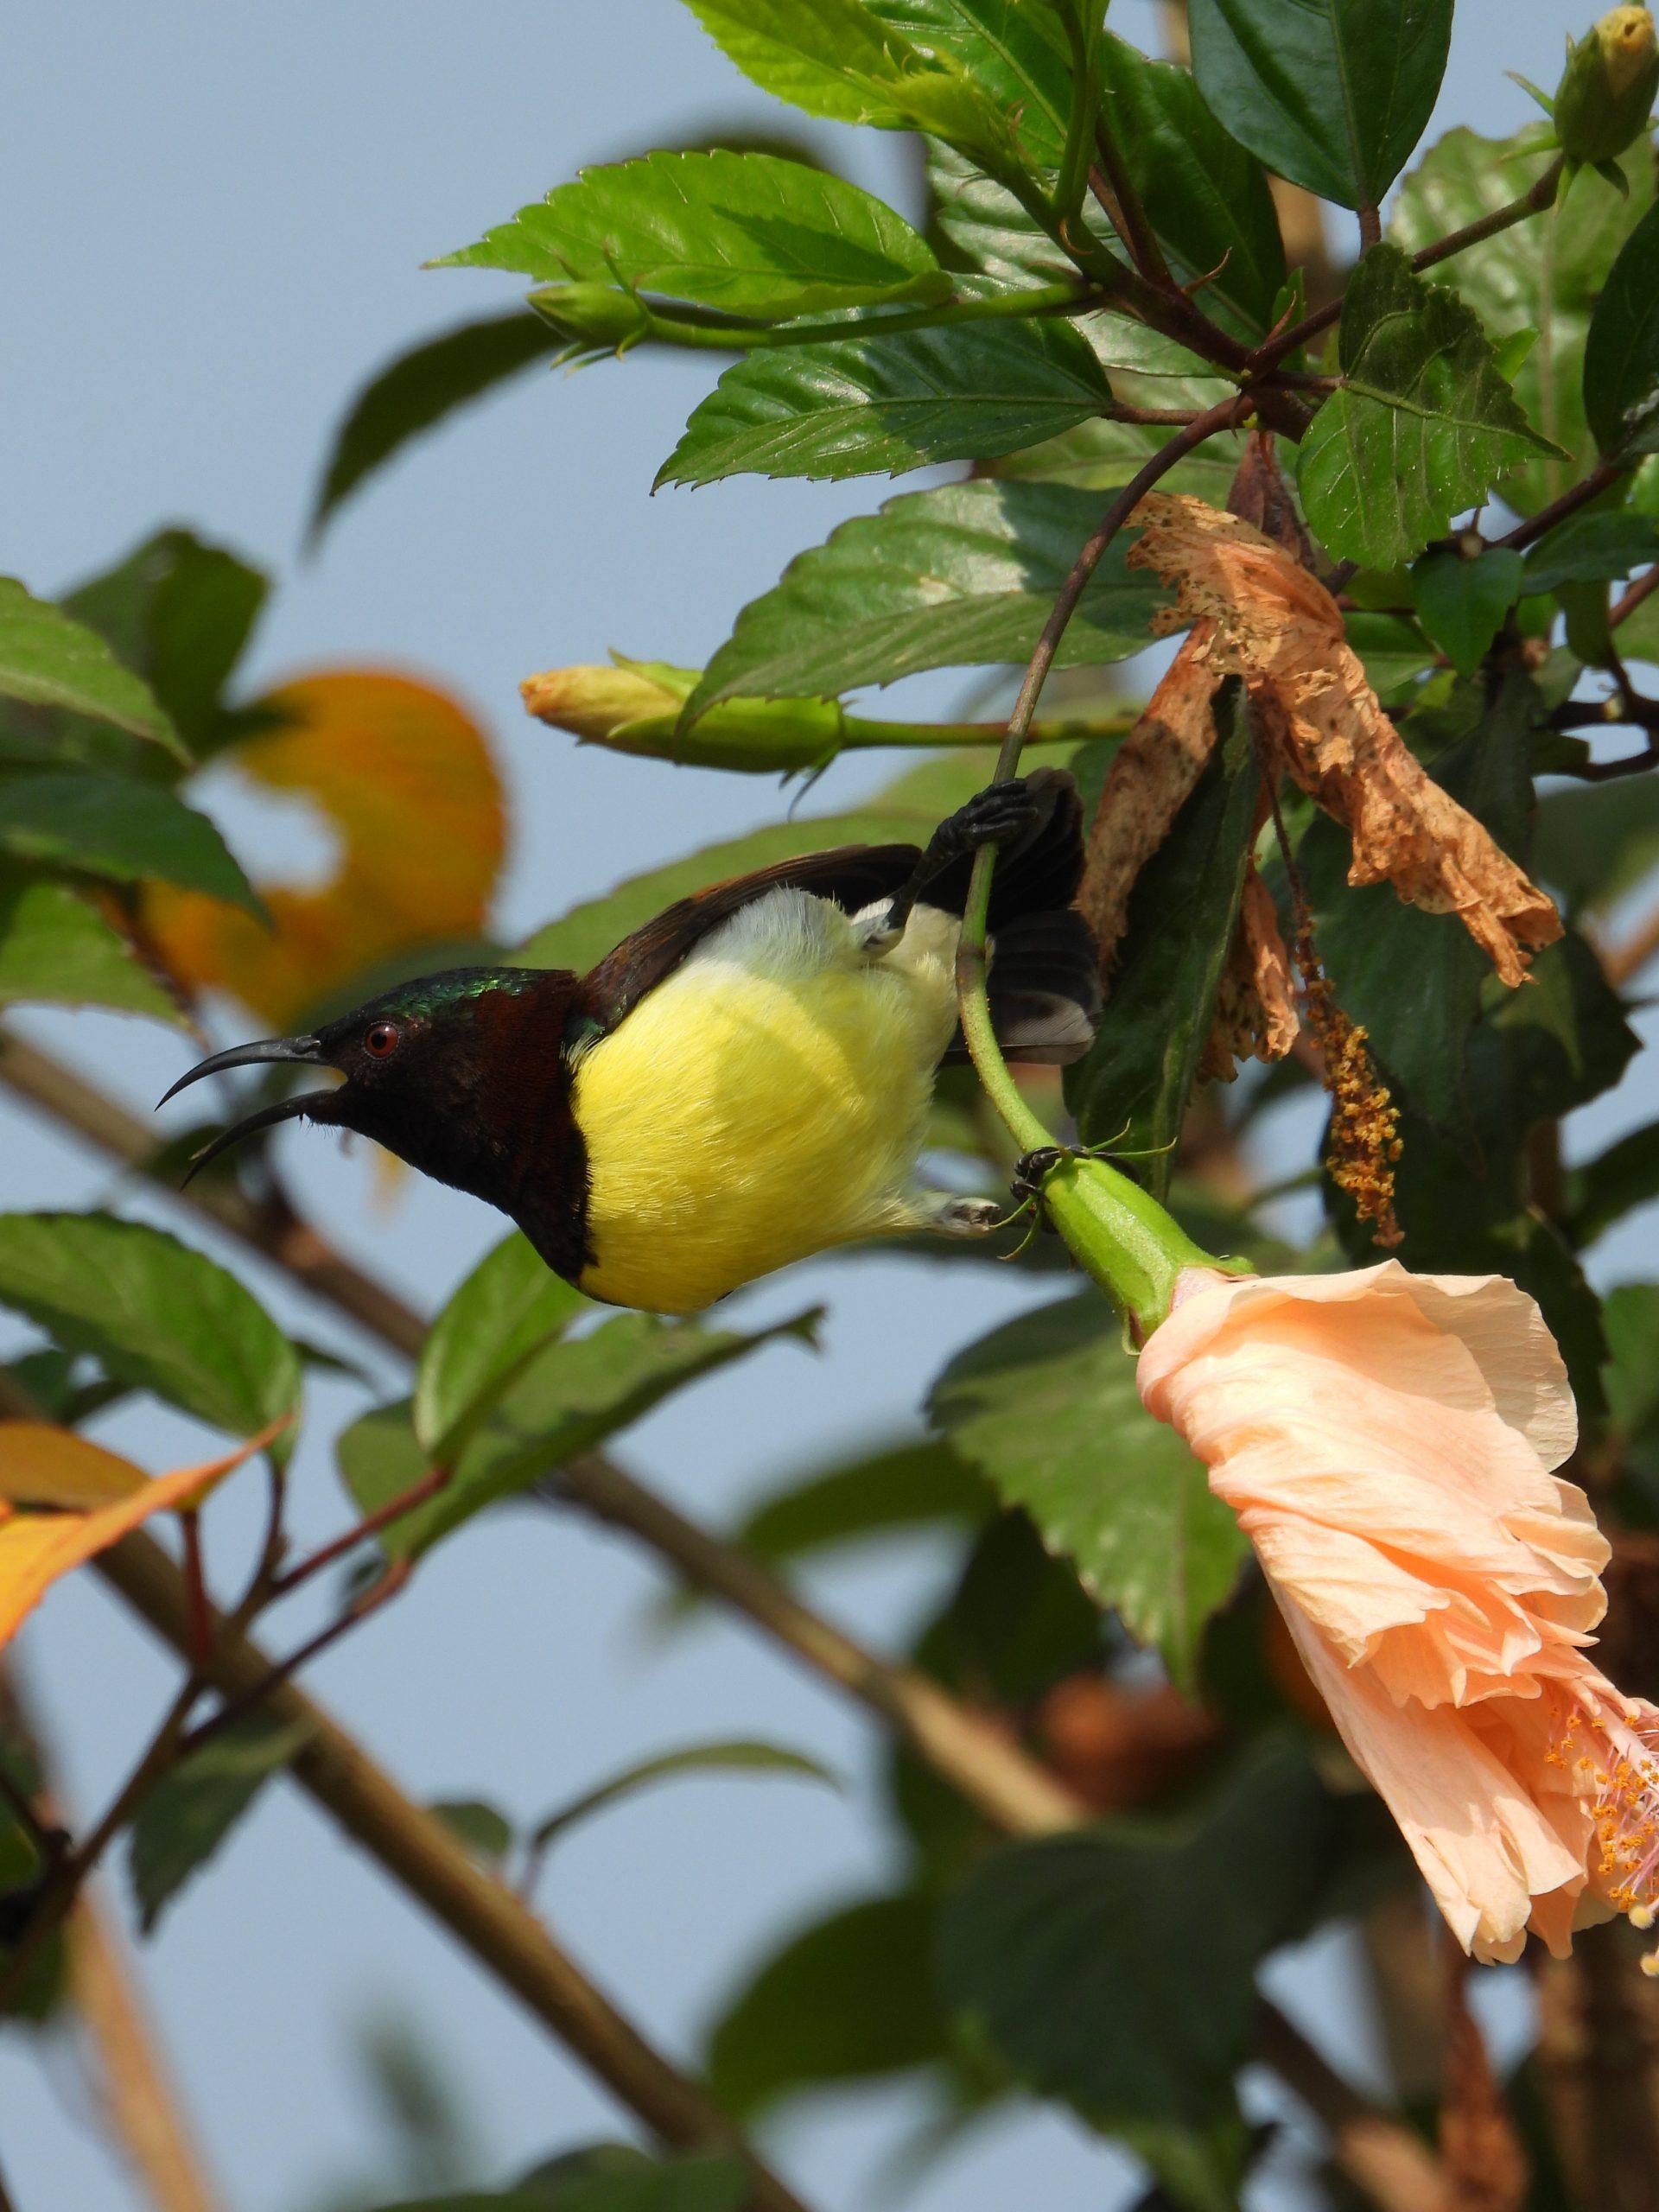 Hummingbird on a plant